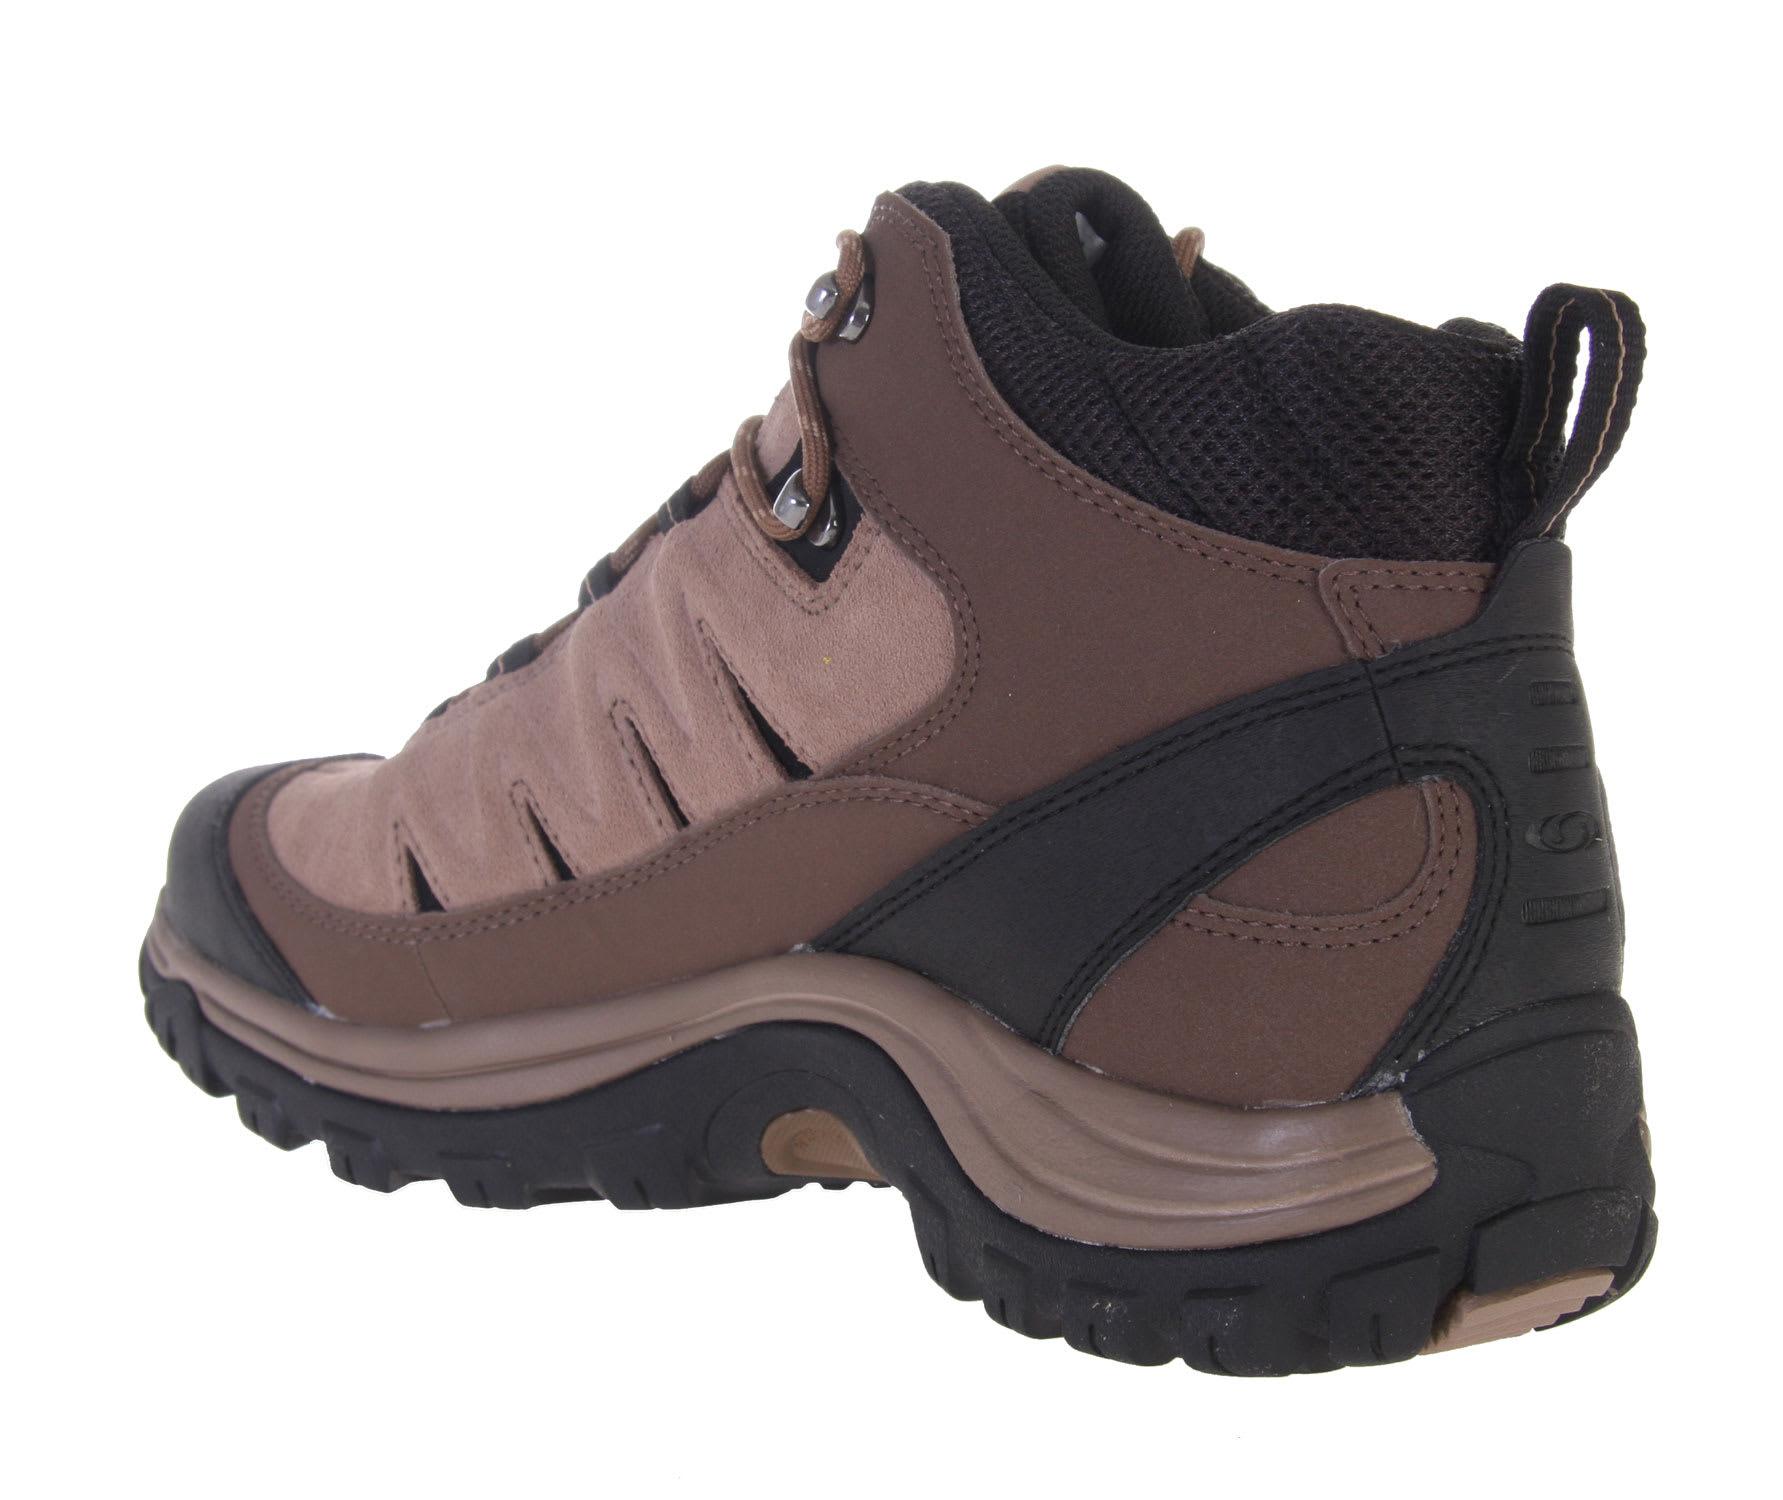 Salomon Exit Peak Mid GTX Hiking Shoes